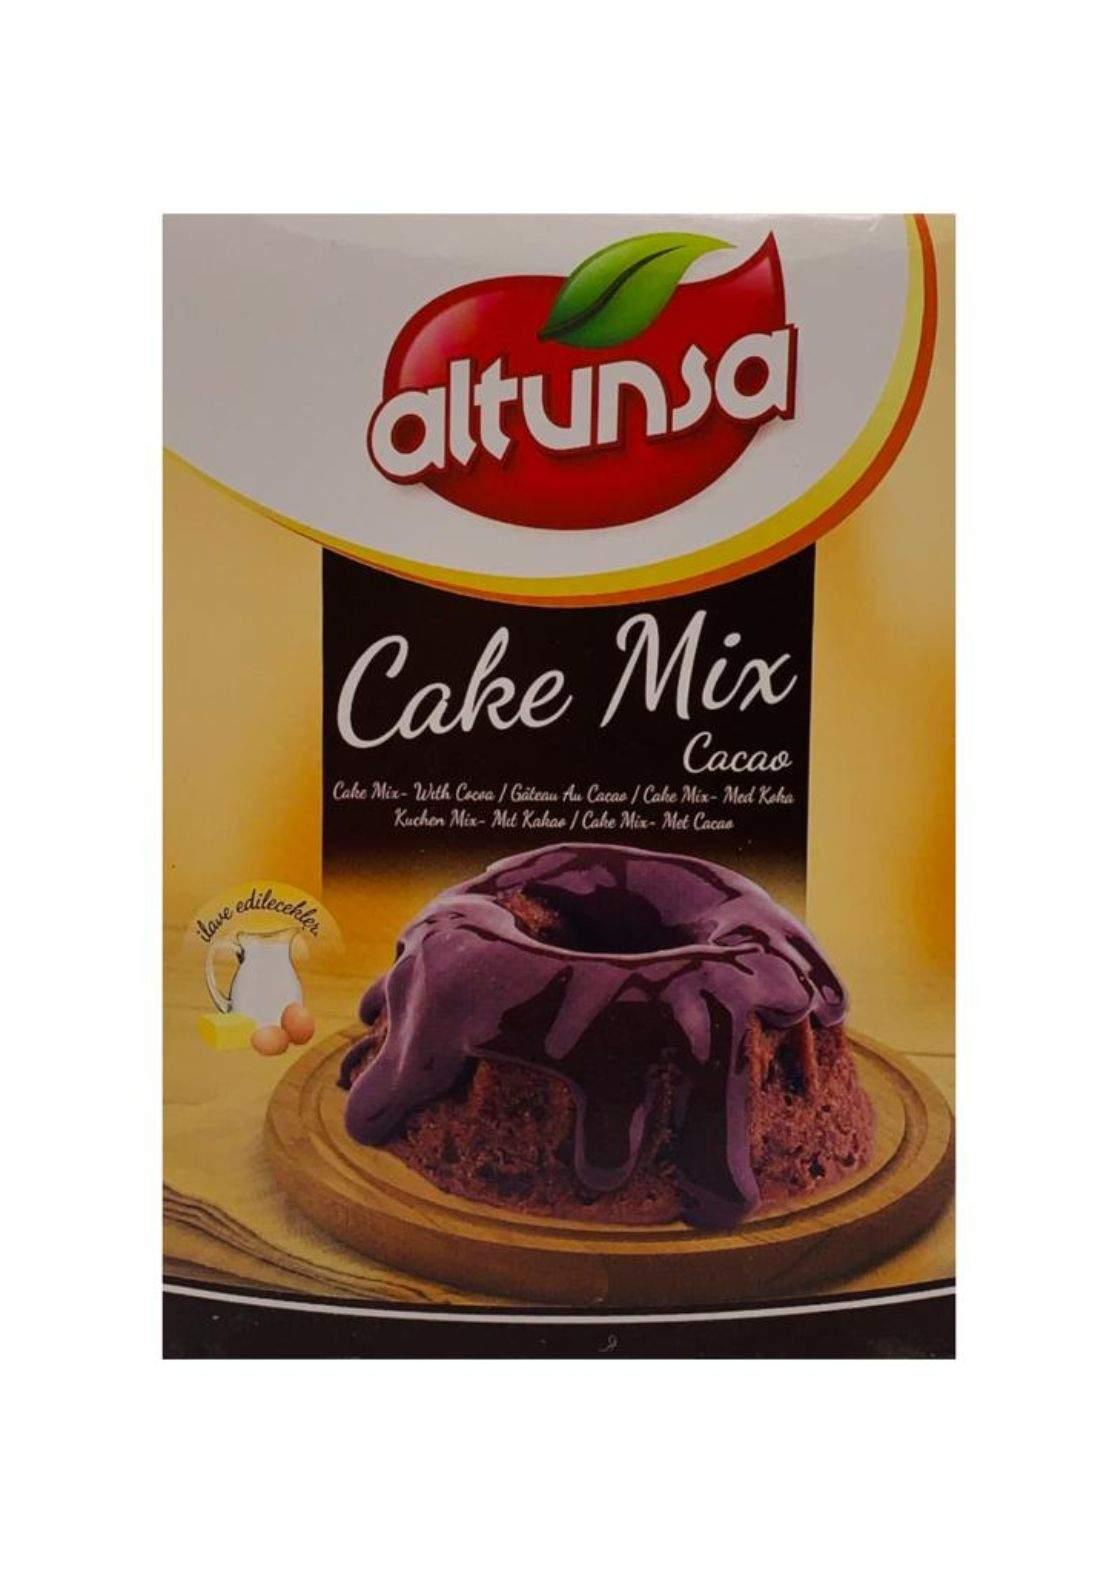 Altunsa  Chocolate cake mix 500g التون سا خليط كيك بالشوكولا